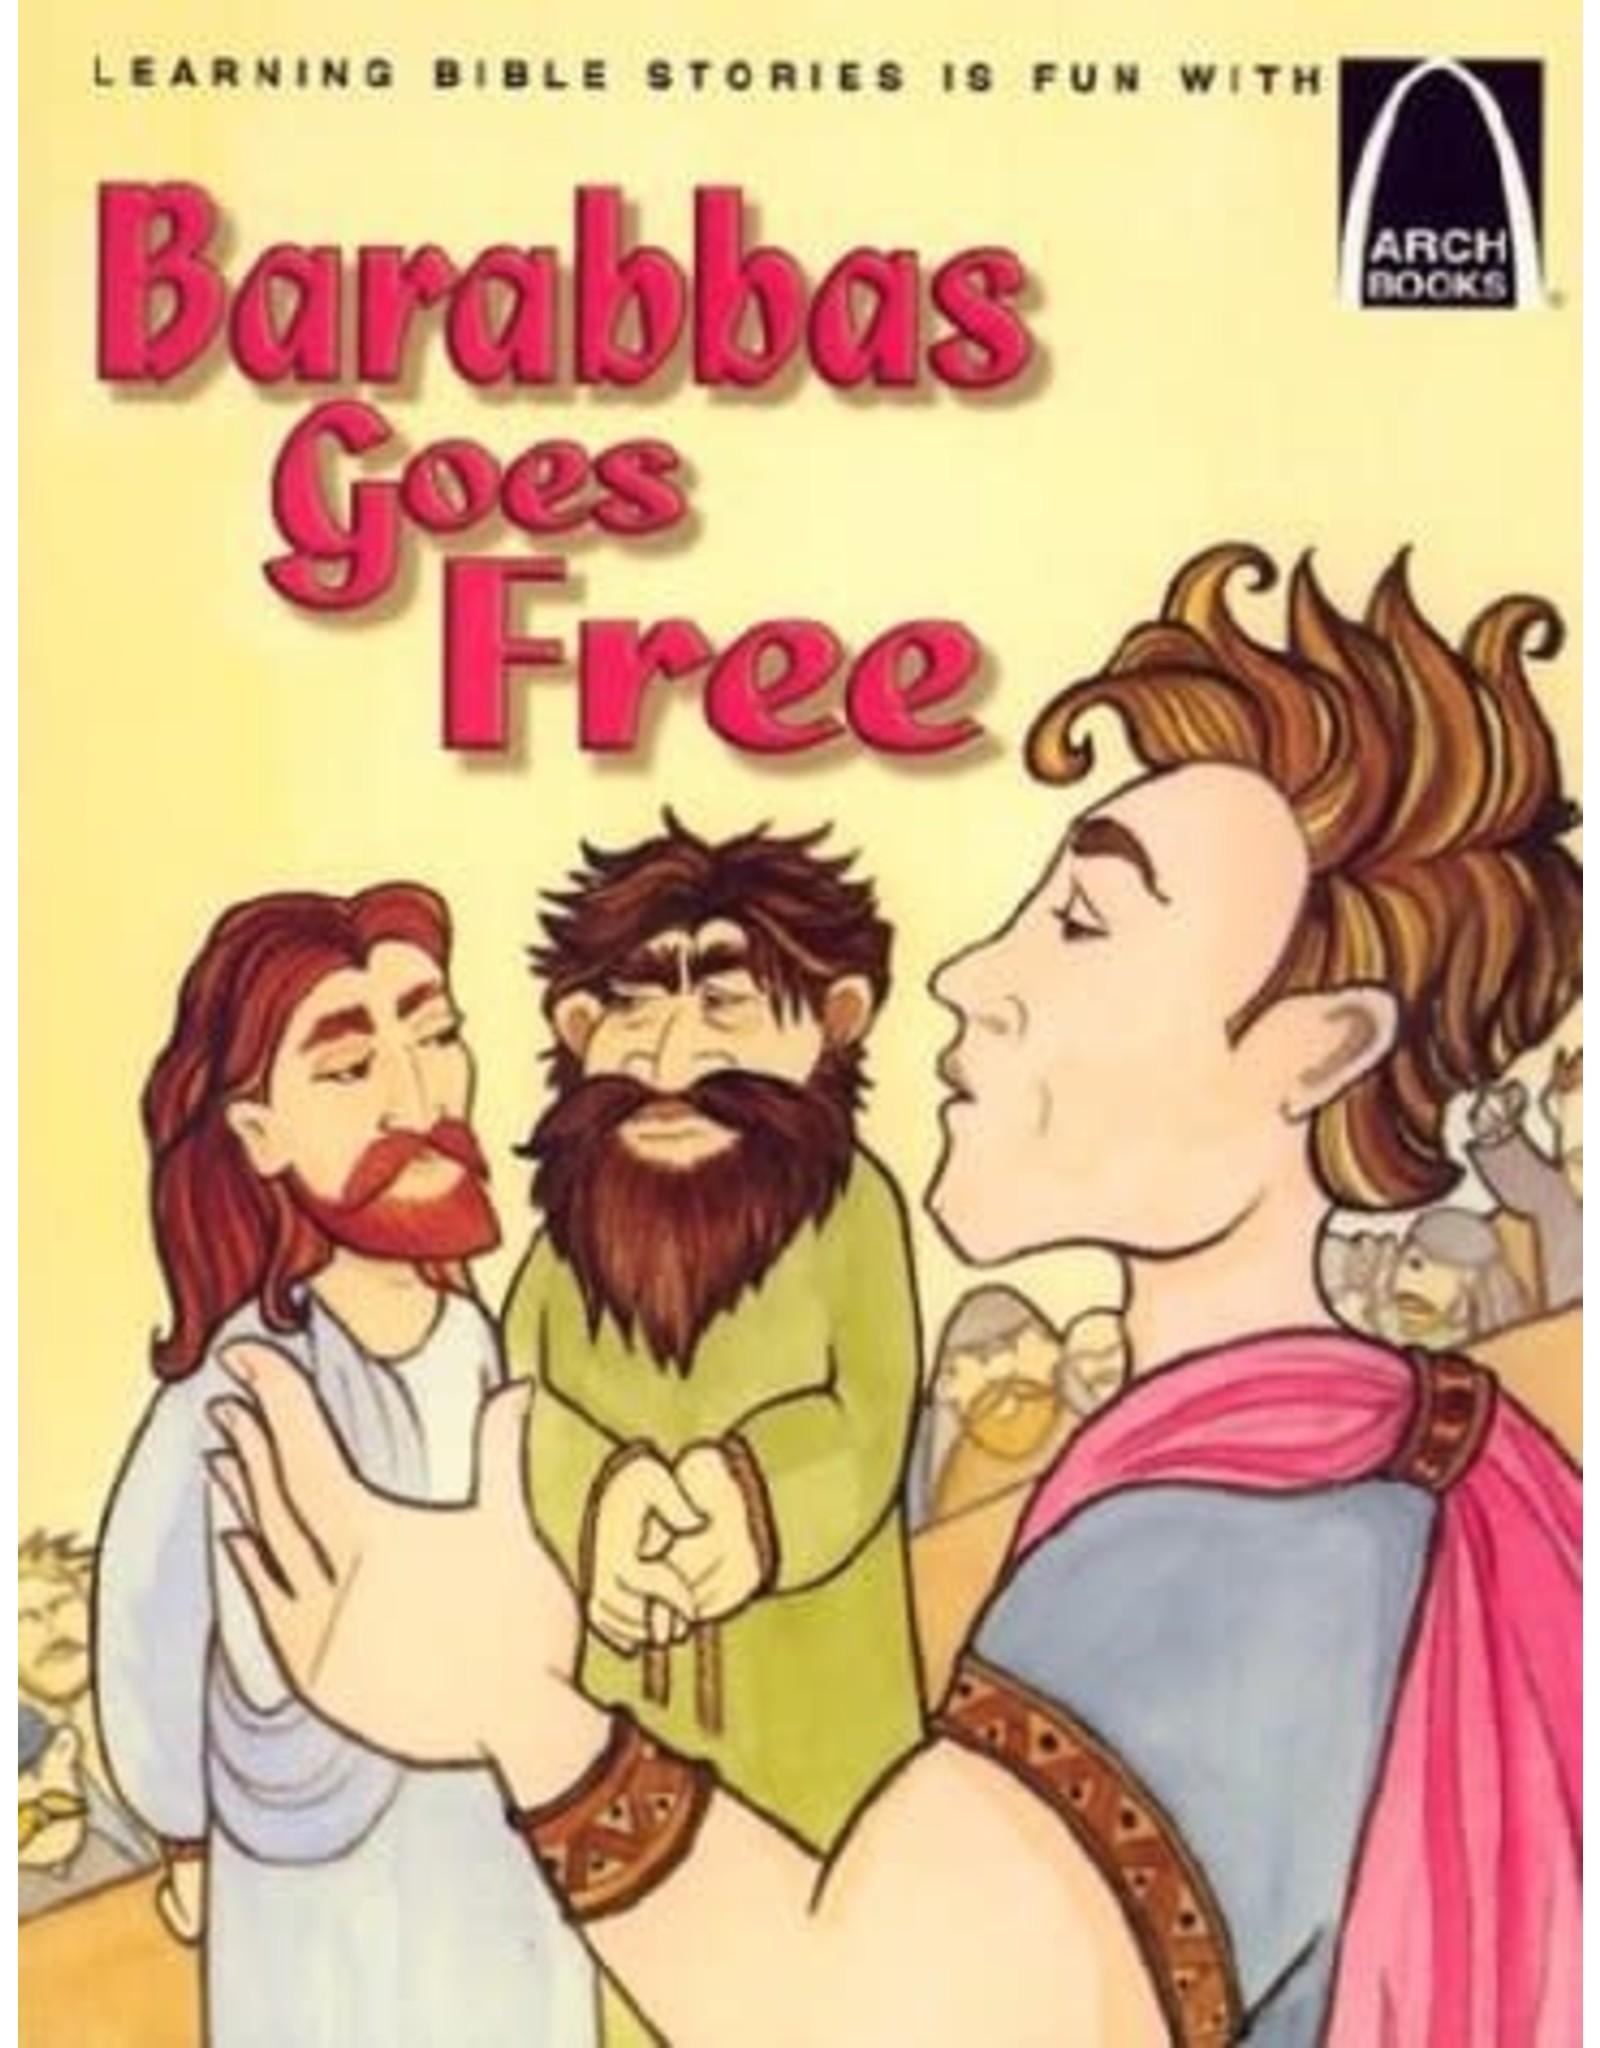 Barabbas Goes Free - Arch Books